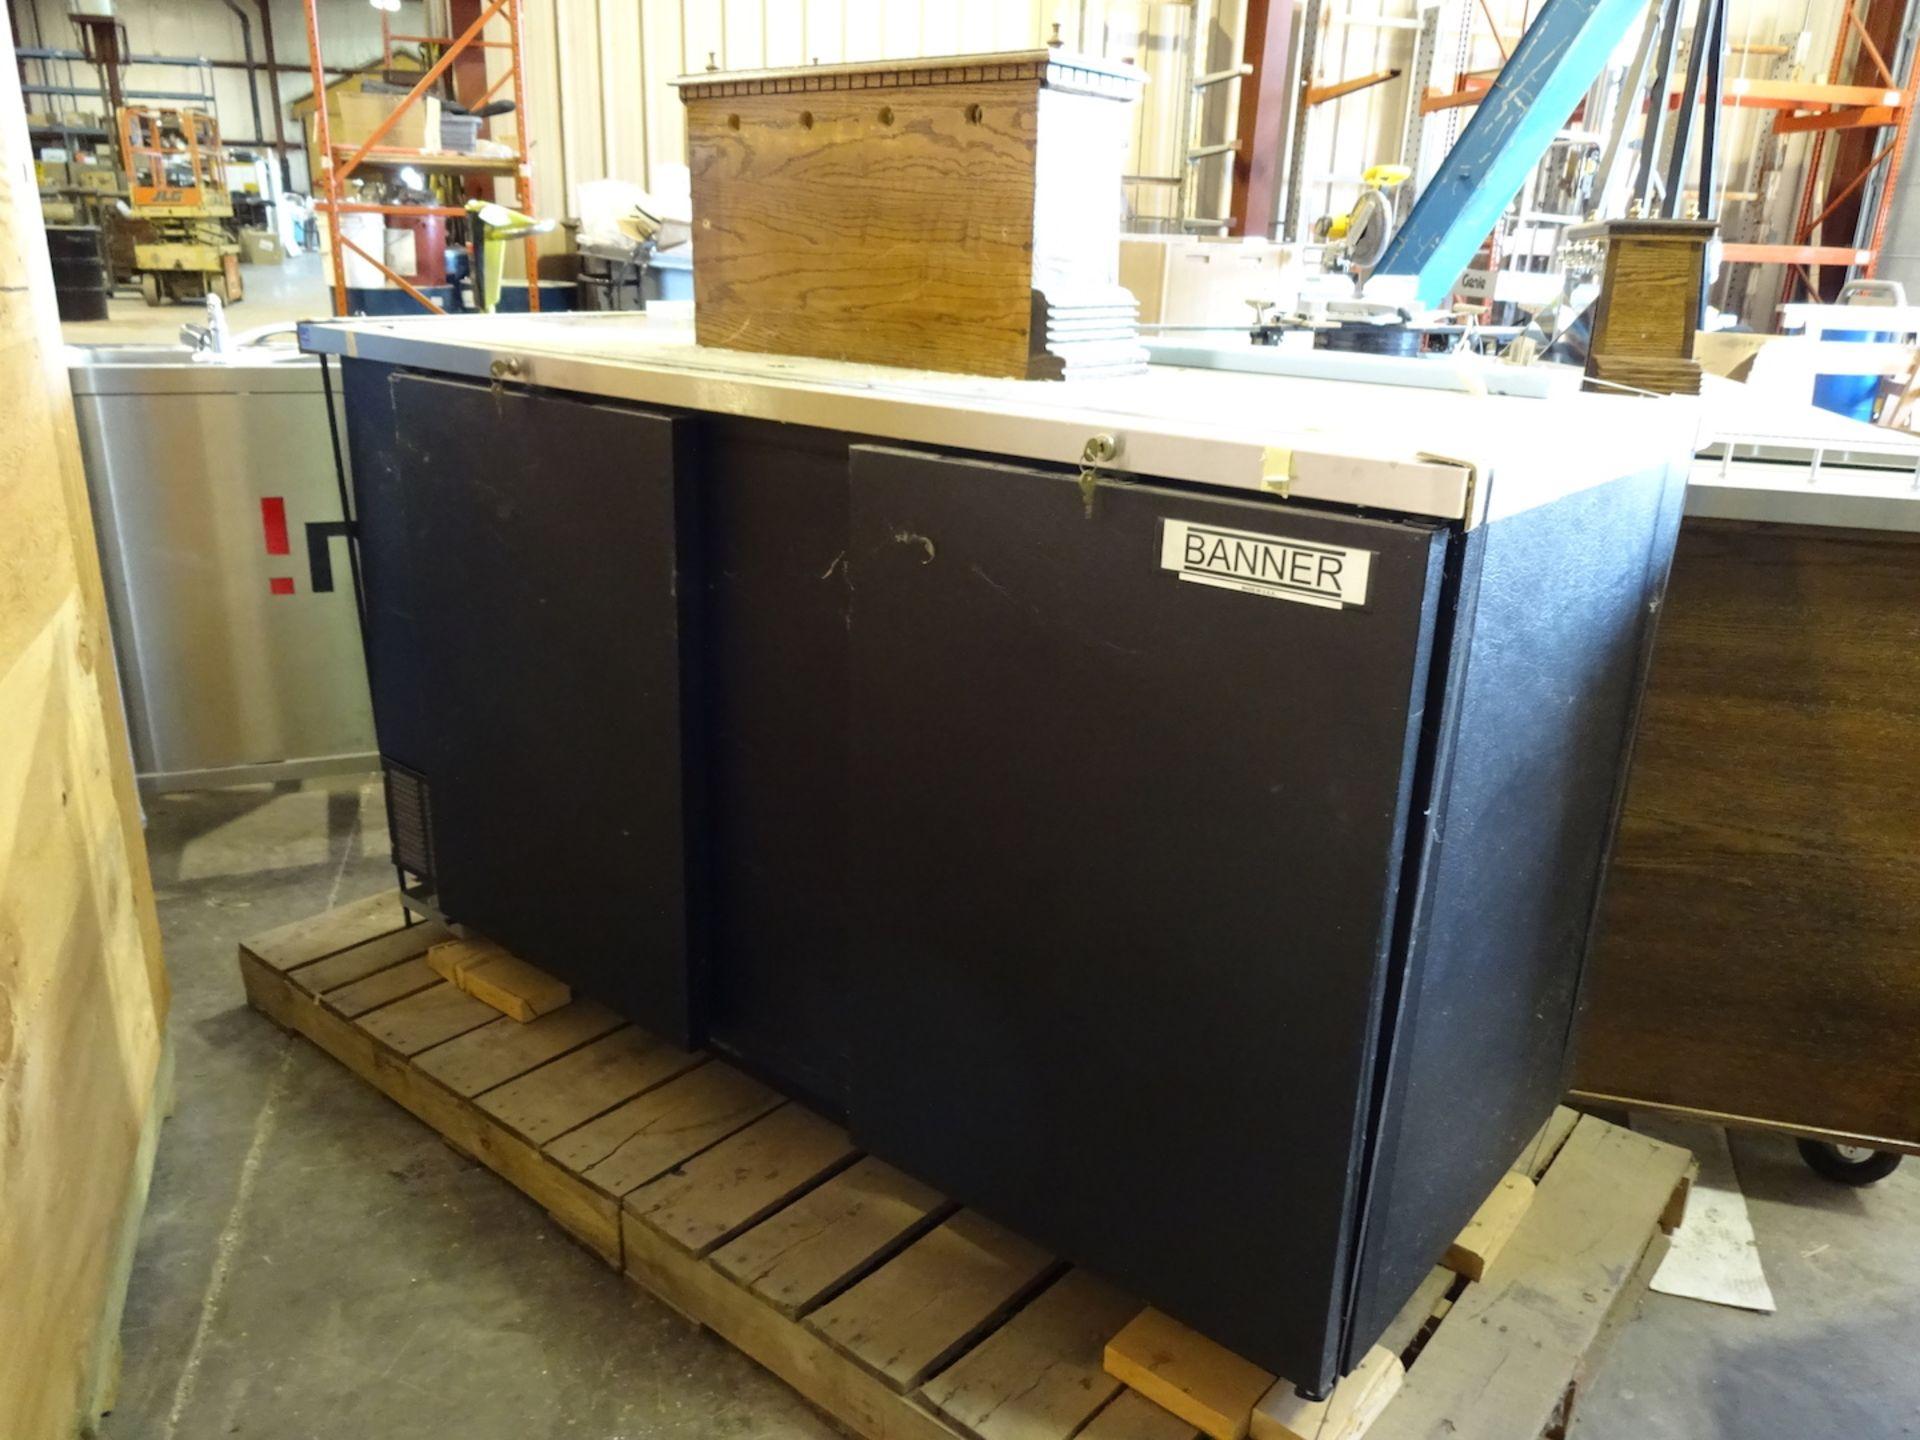 Lot 97 - Beverage Air 69 in. 3-Barrel Draft Beer Dispenser, Guinness Coffin Box